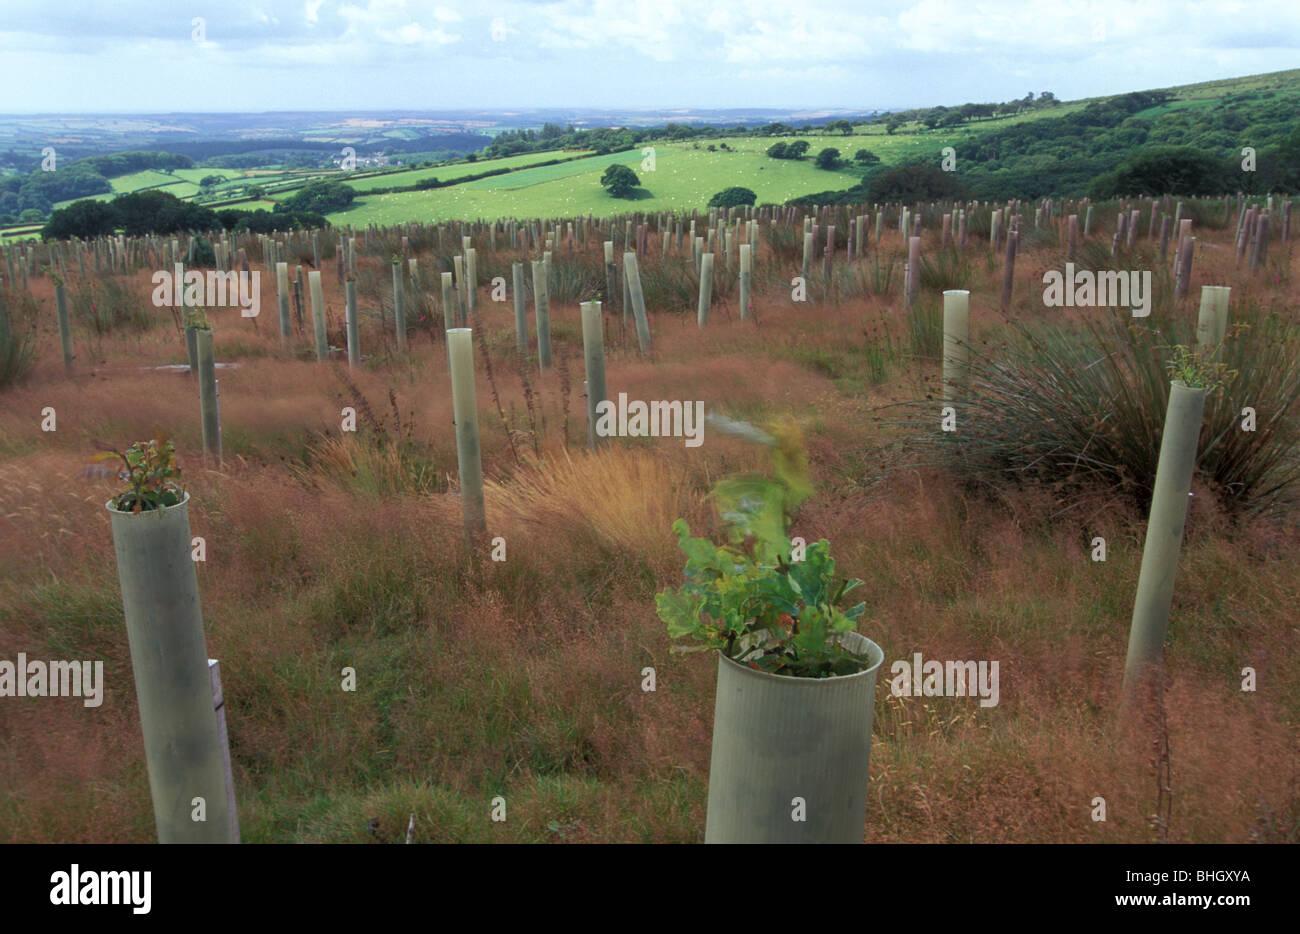 Habitat restoration from conifer plantation to western sessile oak at the edge of Dendles Wood NNR - Stock Image